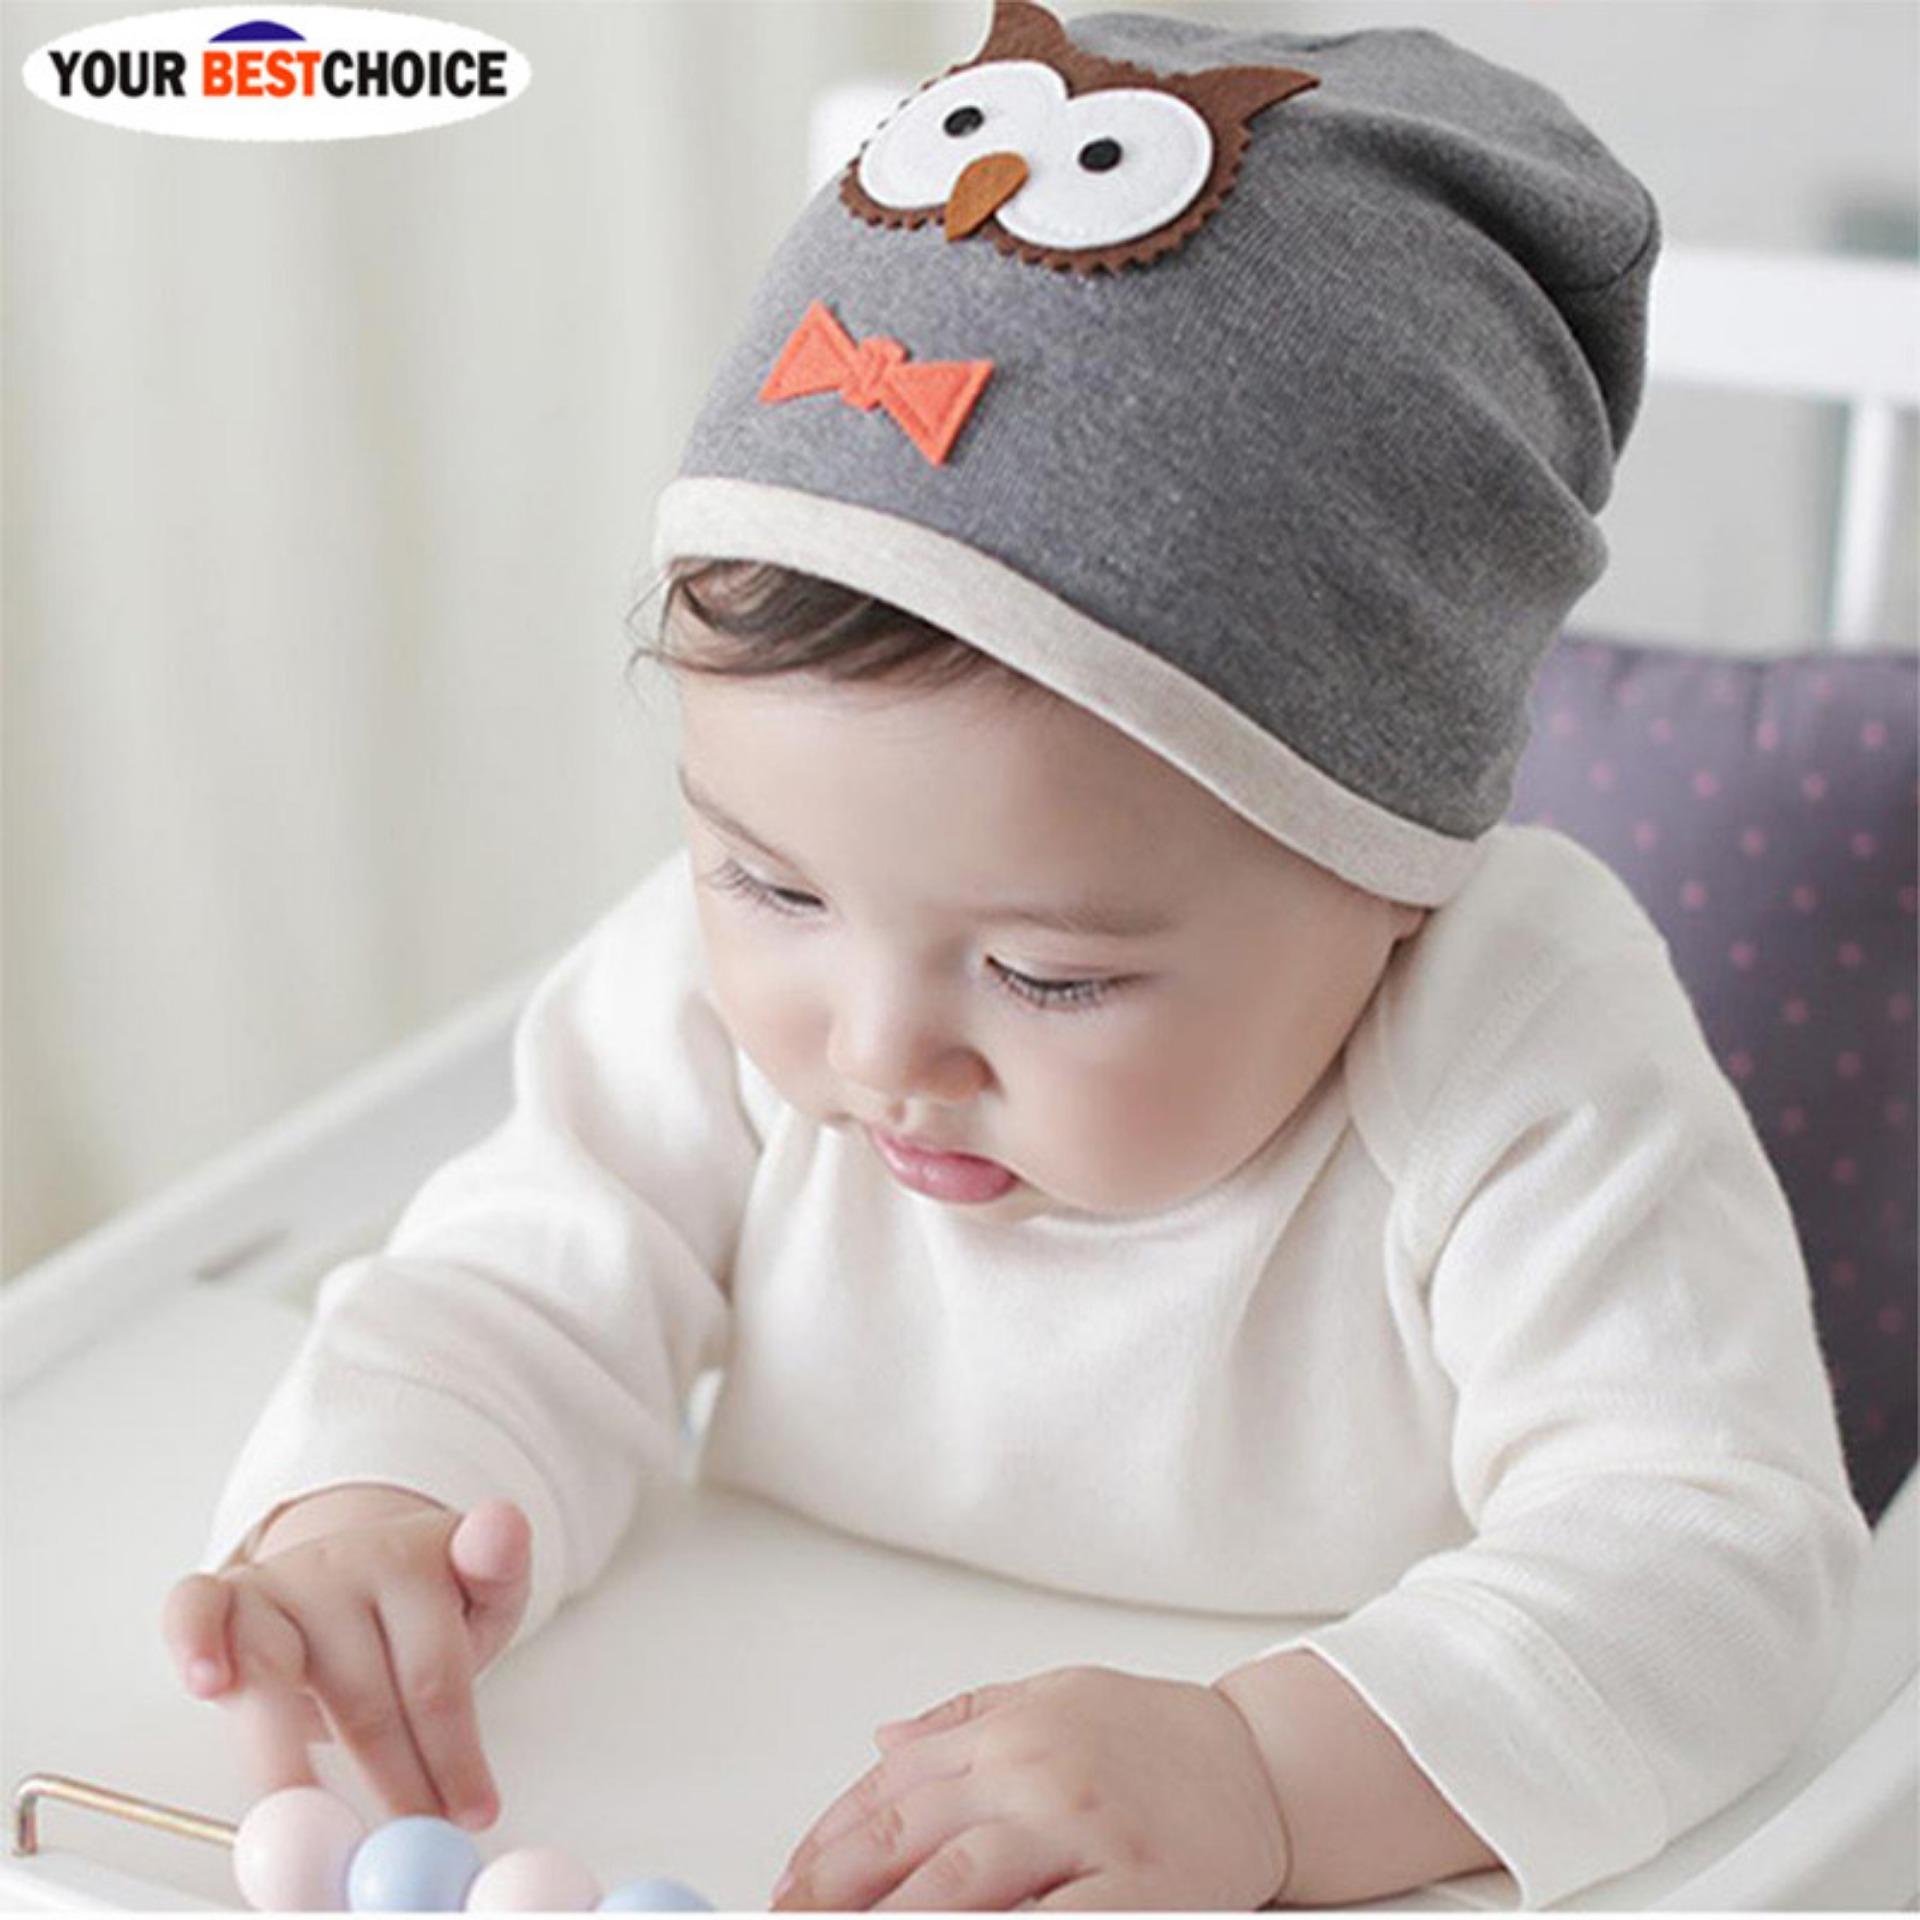 YBC Topi Kupluk Unisex Bayi Baru Lahir Bahan Katun Lembut Warna Abu-Abu